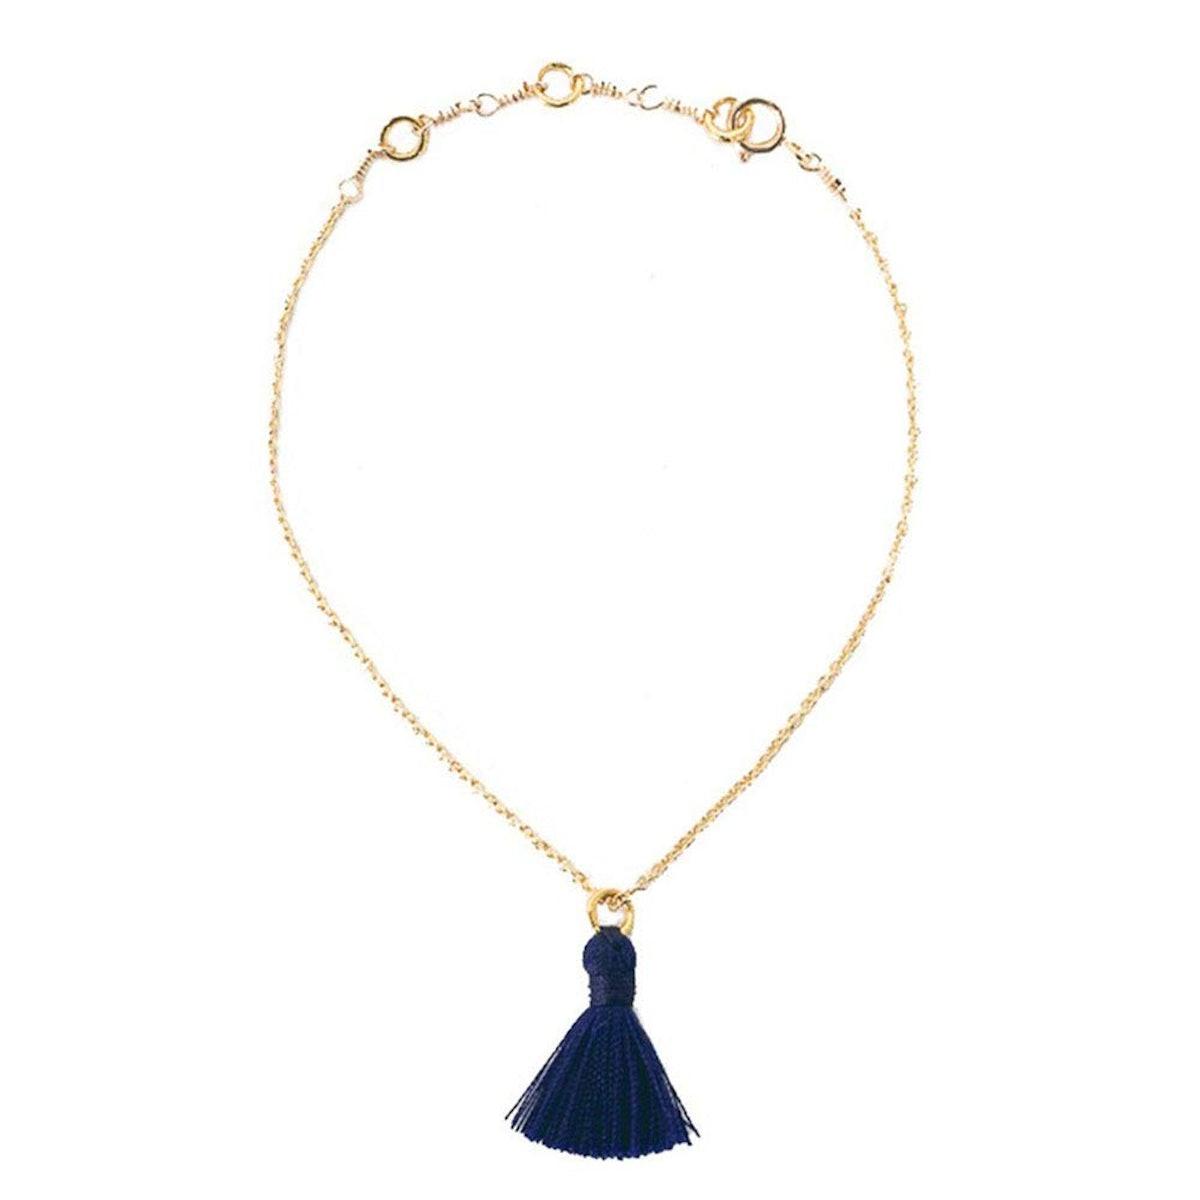 Dainty Tassel Bracelet - Navy, Dark Blue